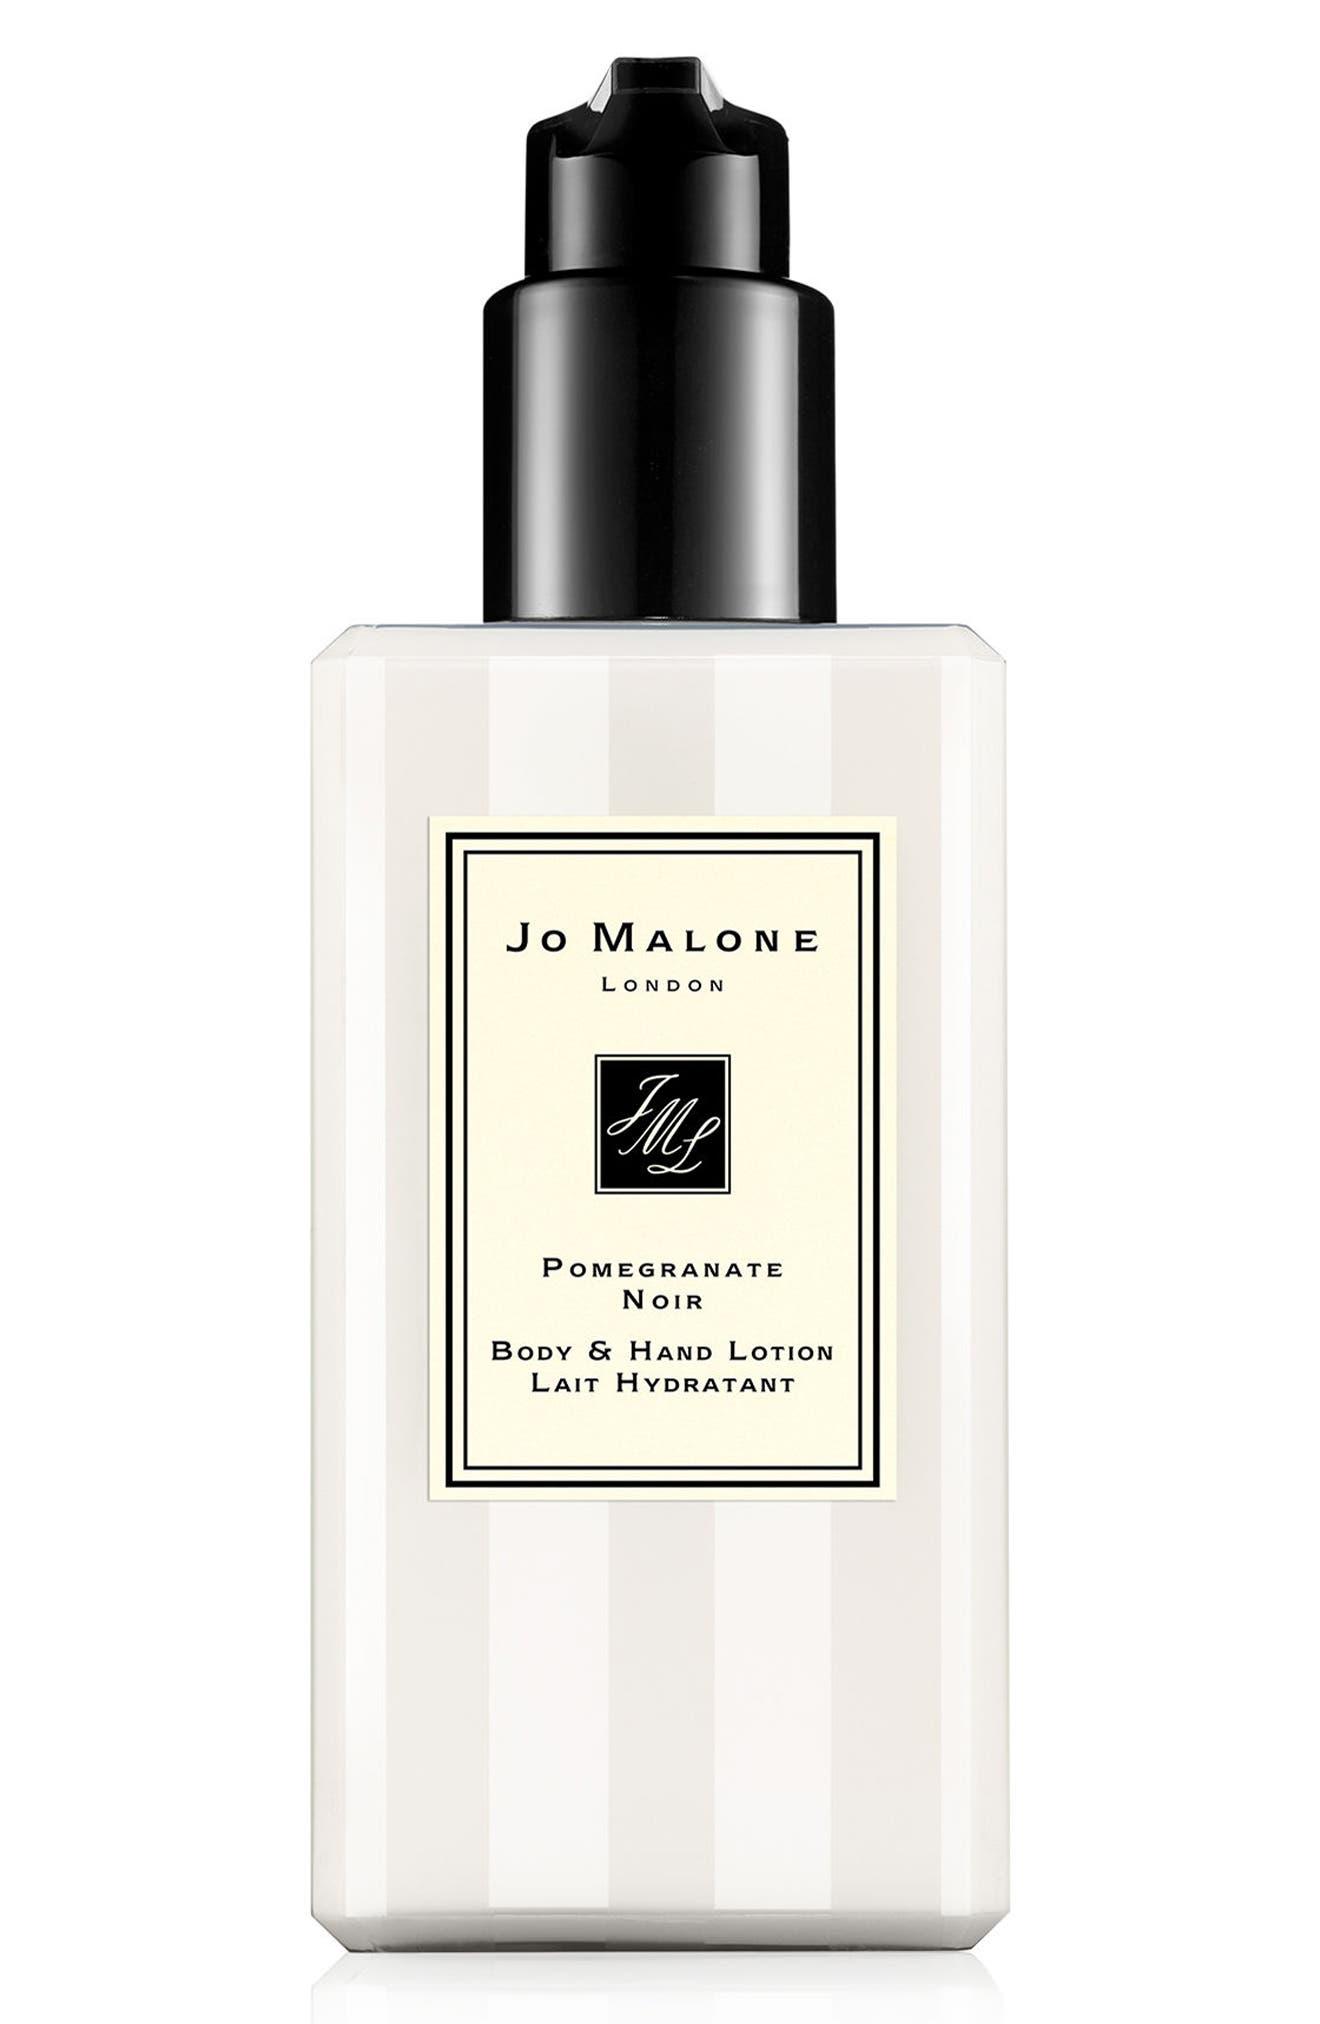 Jo Malone London™ Pomegranate Noir Body & Hand Lotion